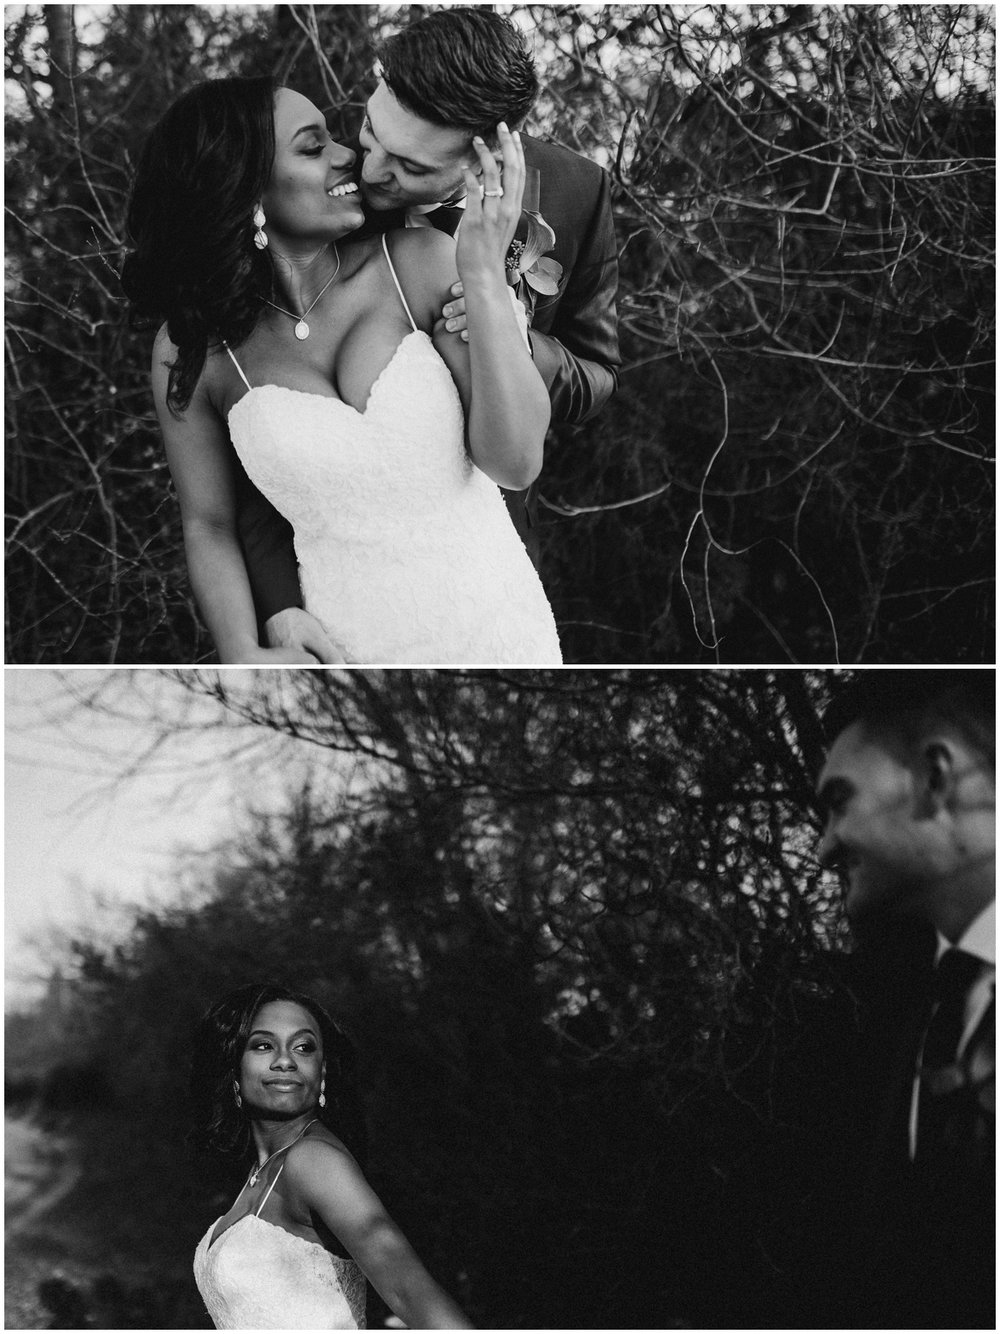 shipley_memphis_wedding_photographer_111.jpg